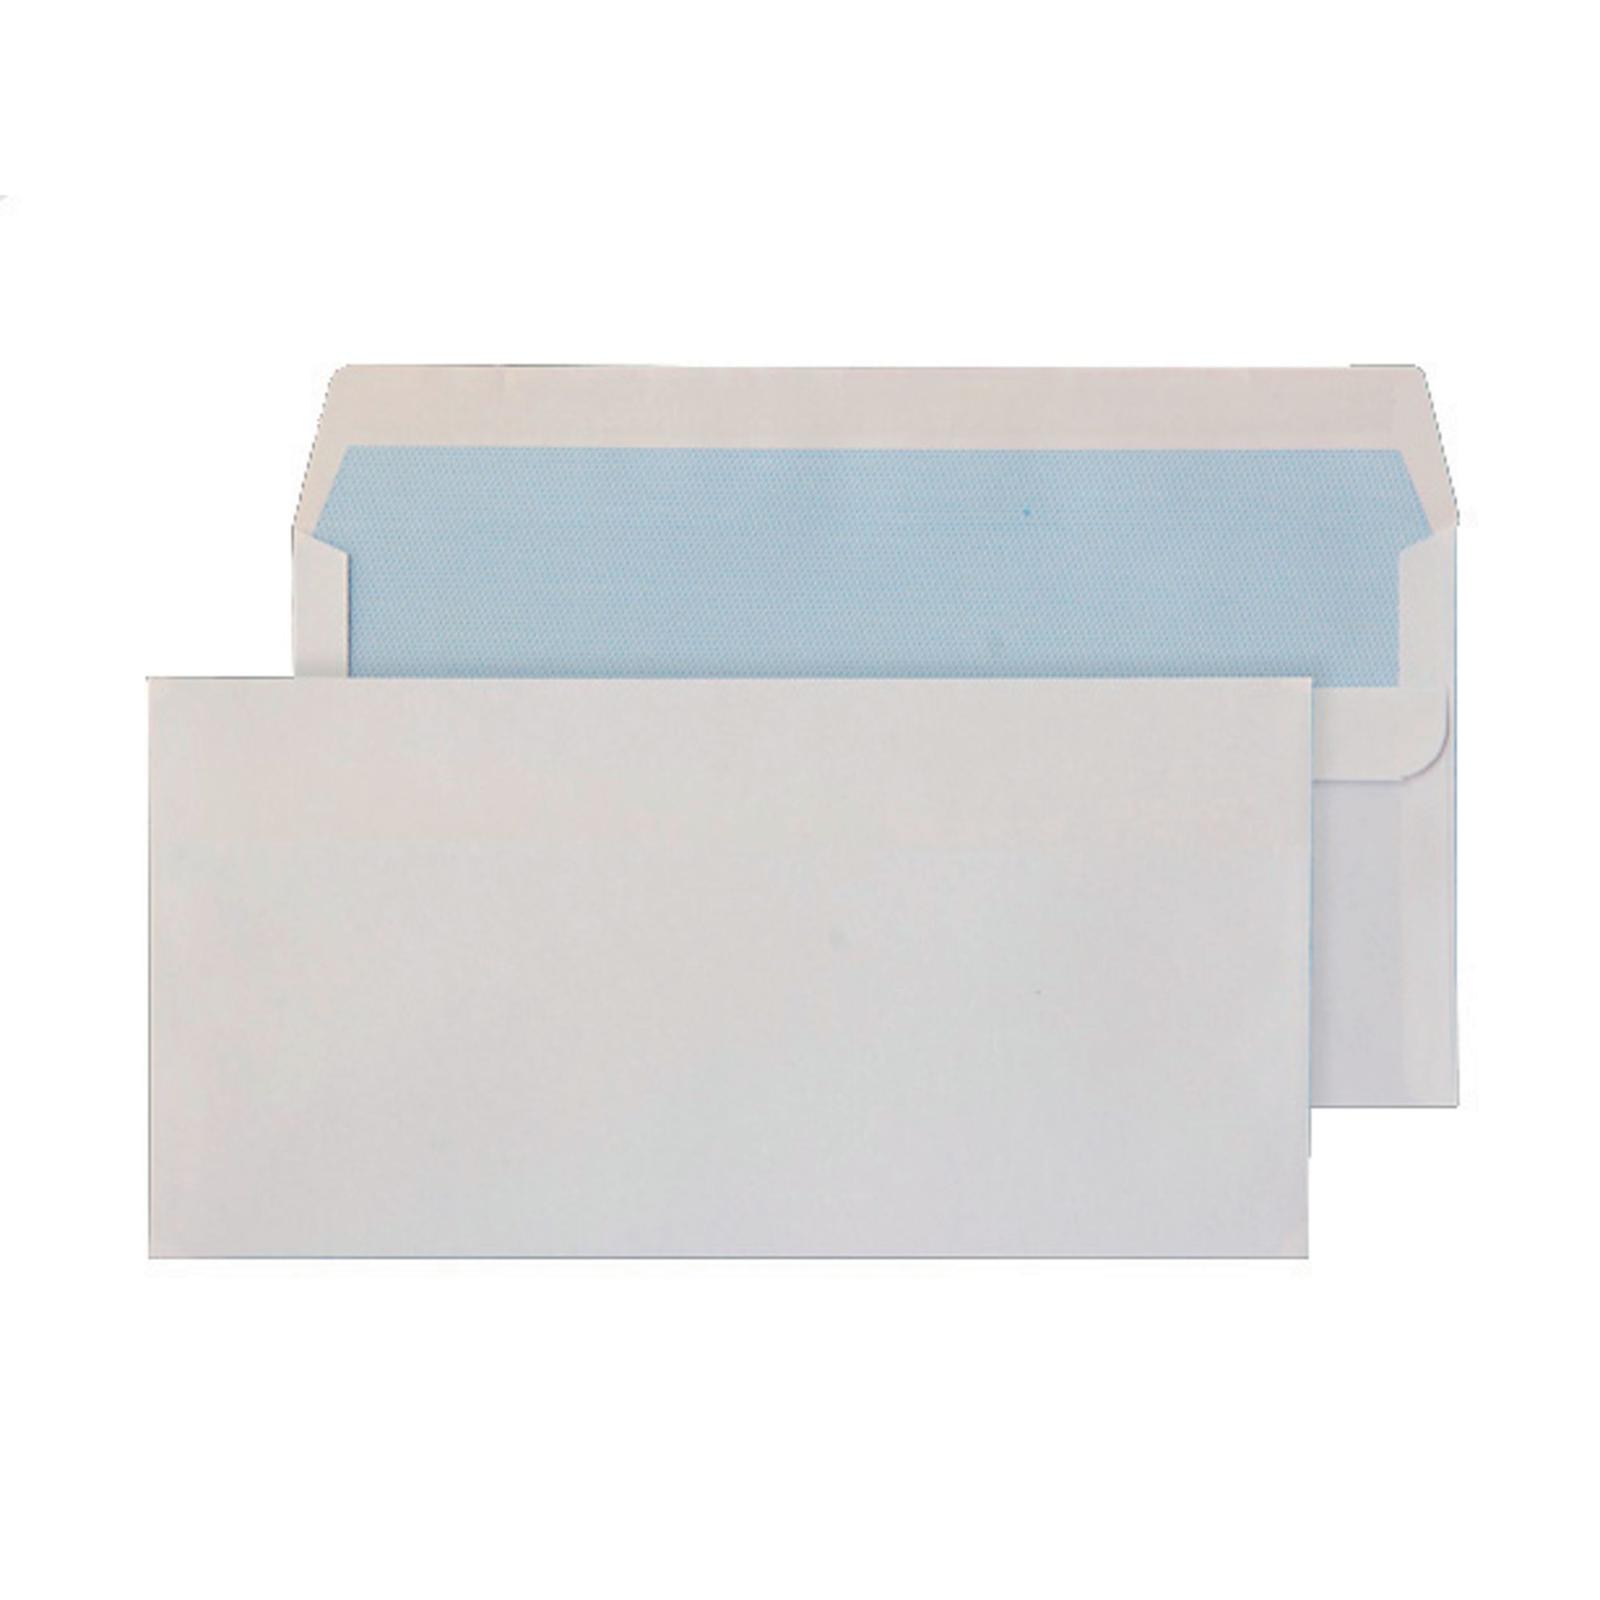 DL White Self Seal Wallet Envelopes - Pack of 50